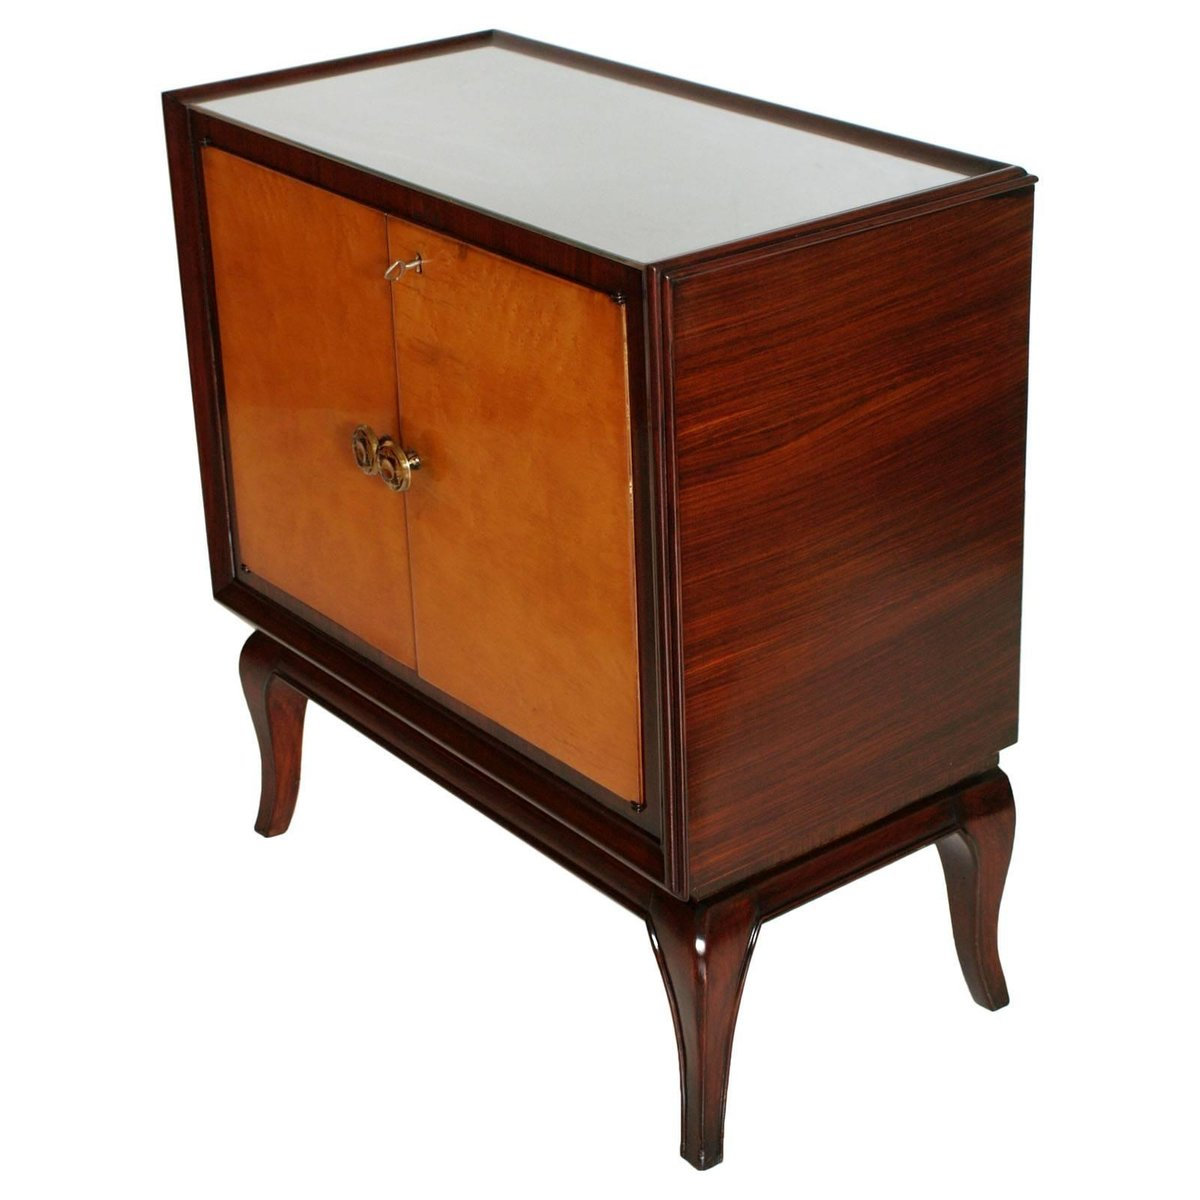 art deco mahagoni wurzel ulmenholz spiegelglas servierwagen bei pamono kaufen. Black Bedroom Furniture Sets. Home Design Ideas